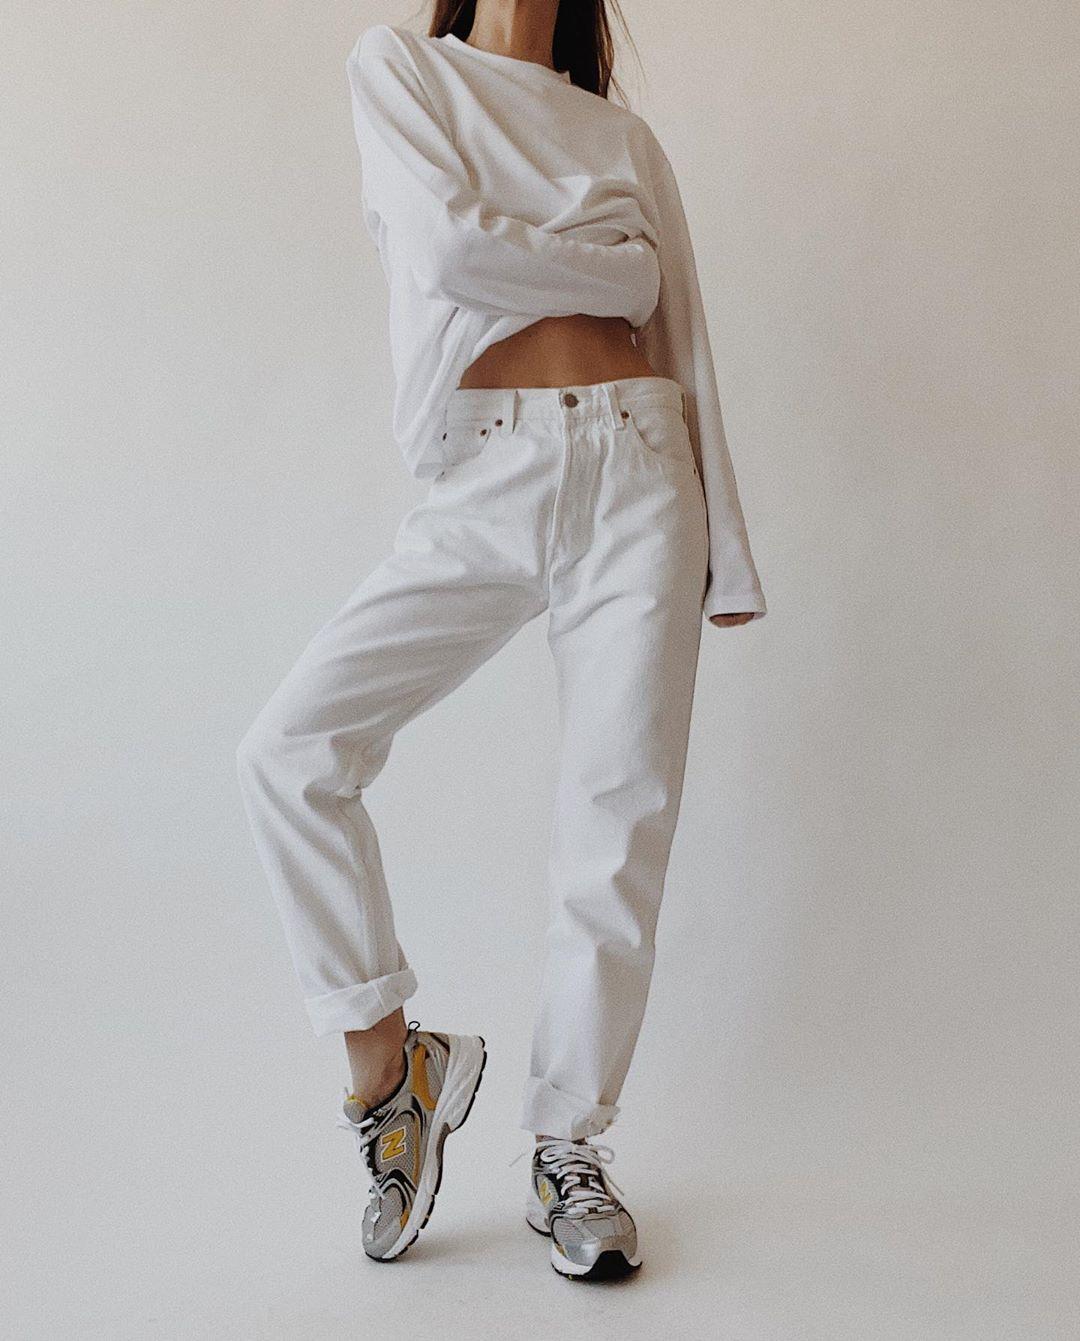 quần trắng jeans boyfriend mùa hè áo thun dài tay